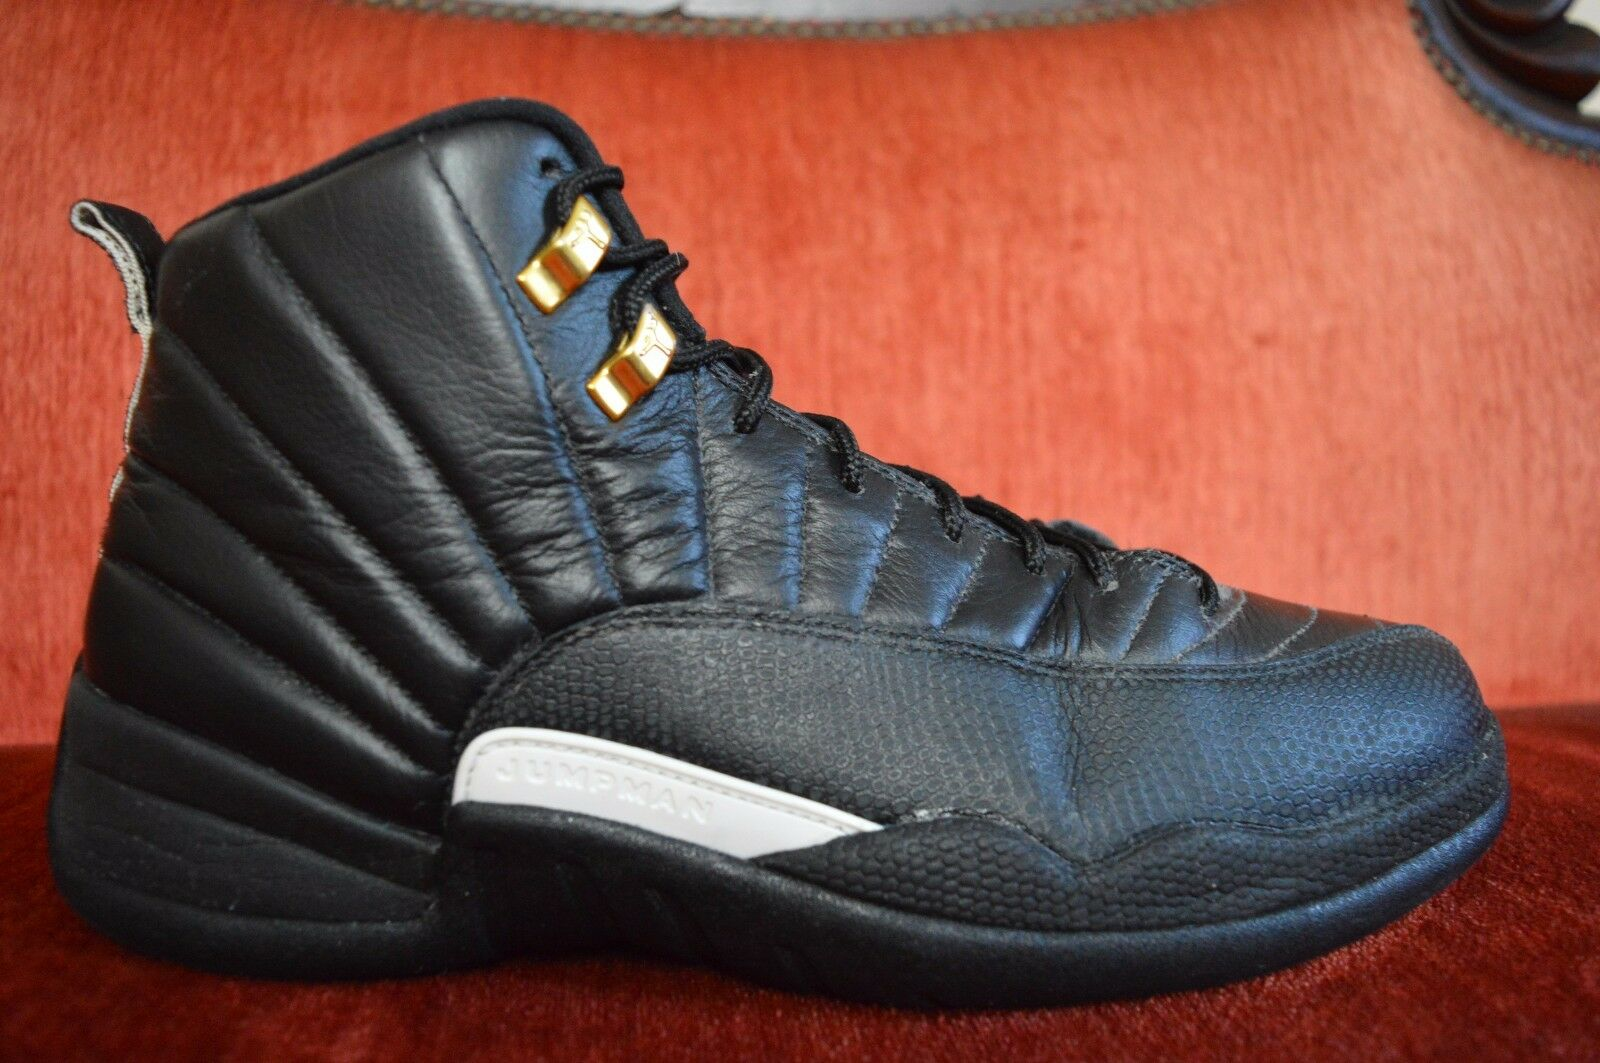 Nike Air Jordan 12 Retro Master Size 11.5 Black White Metallic gold 130690 013